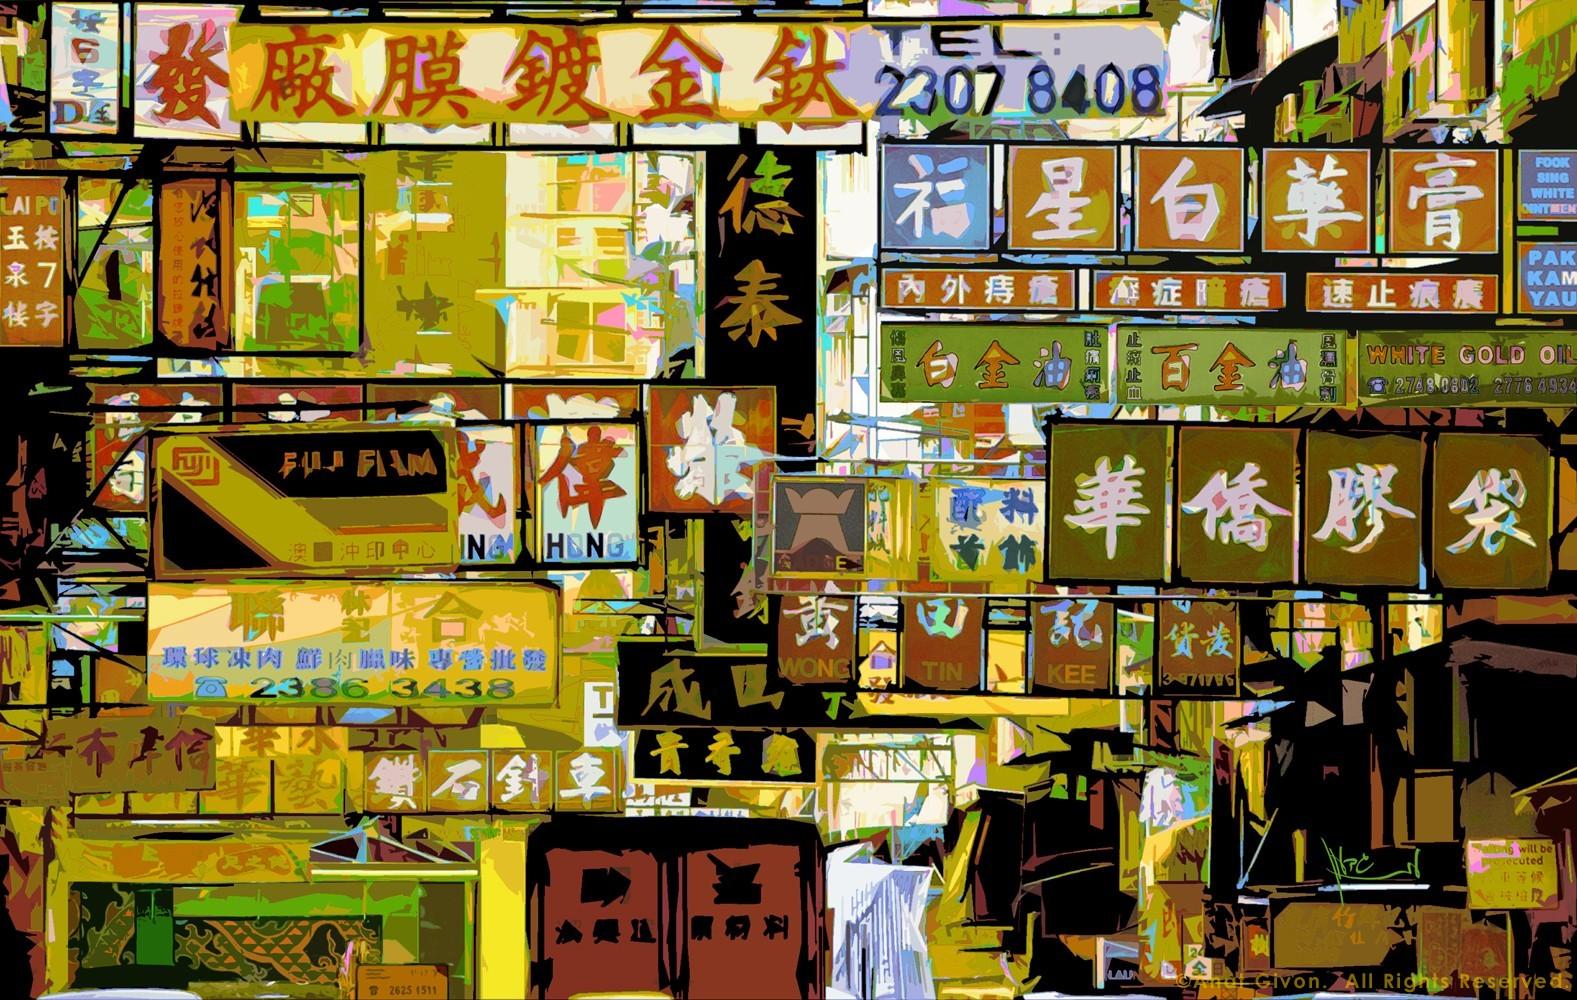 Signs Sham Shui Po Light Green, HK